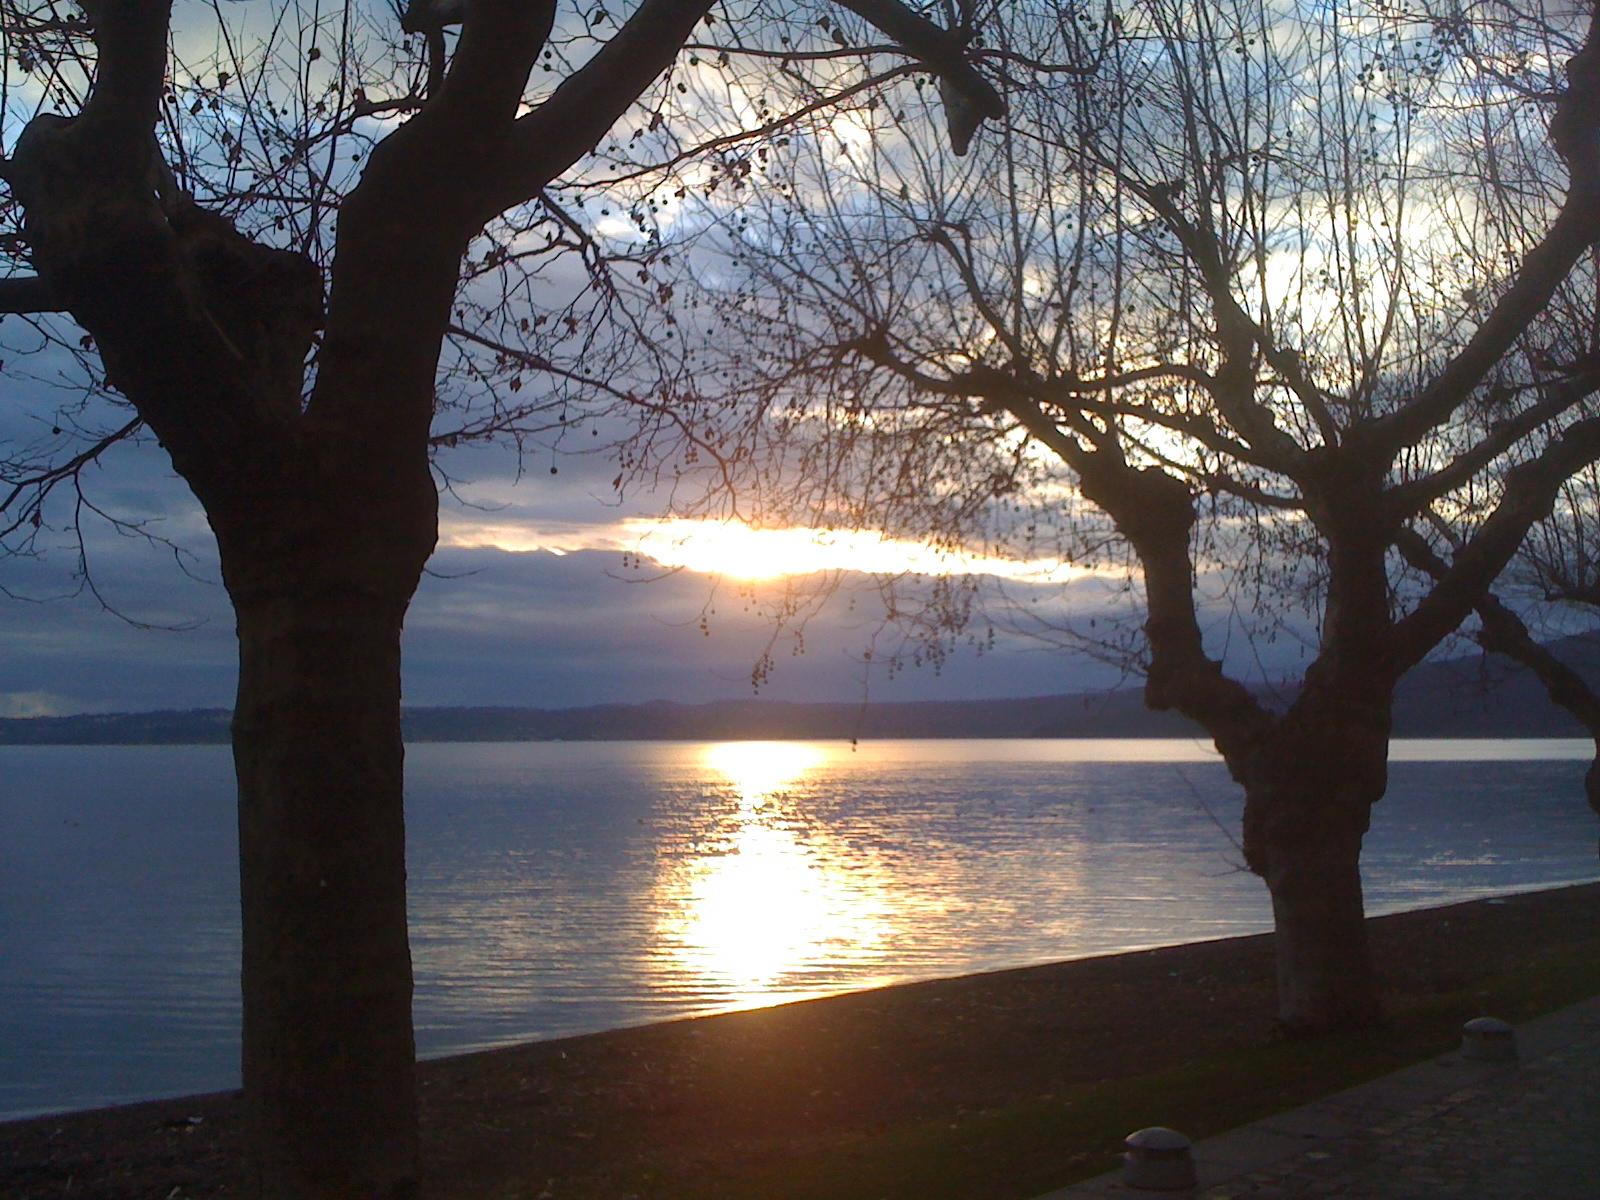 lago-trevignano